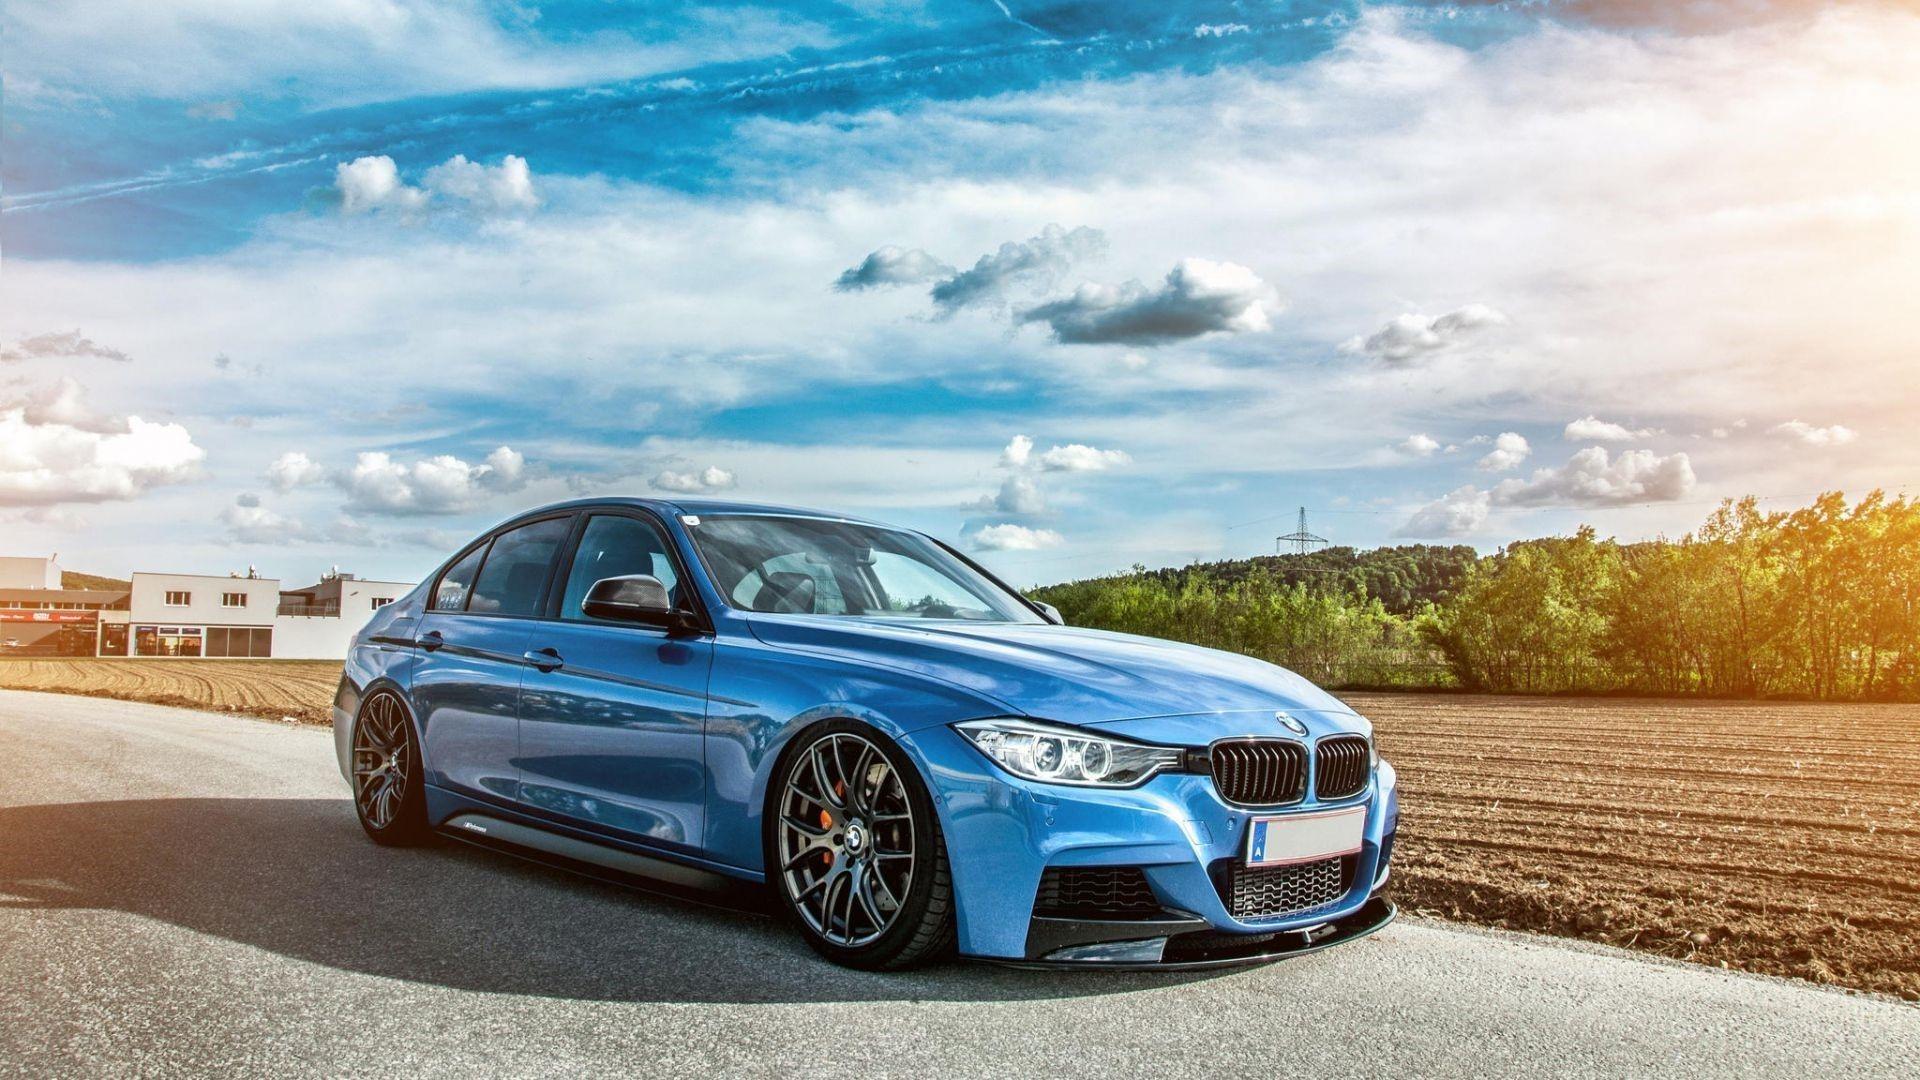 4K BMW Samsung Wallpapers